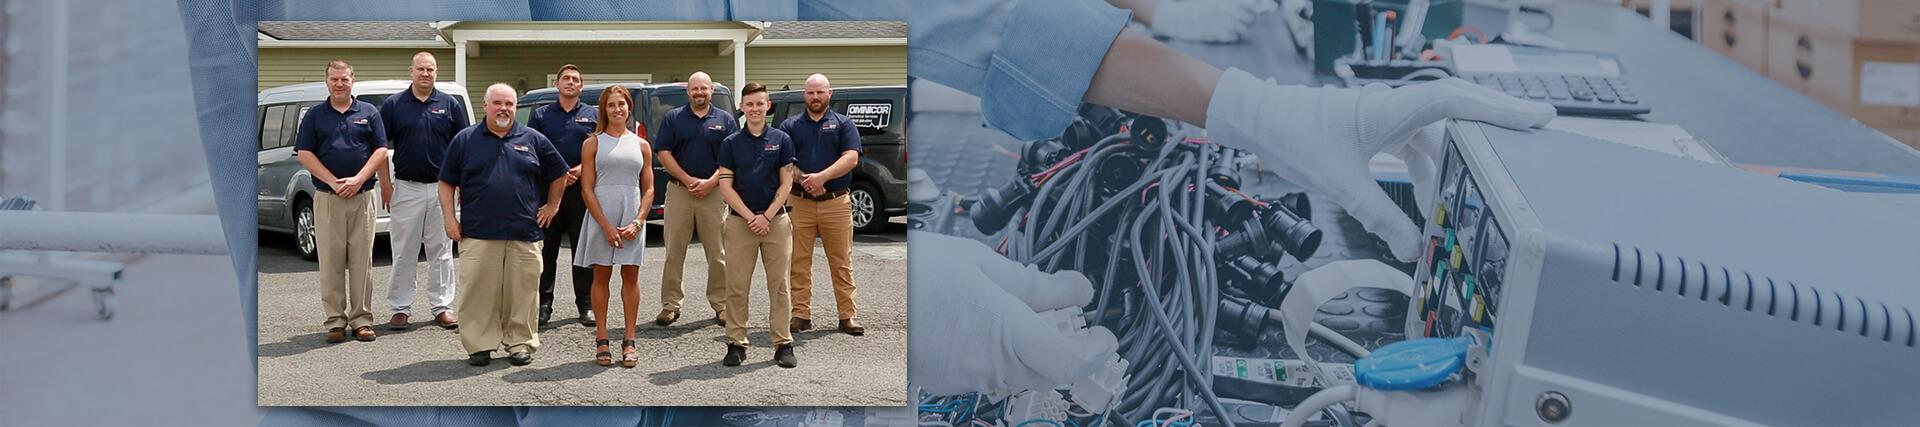 New York Medical Equipment Repair, Service, & Maintenance